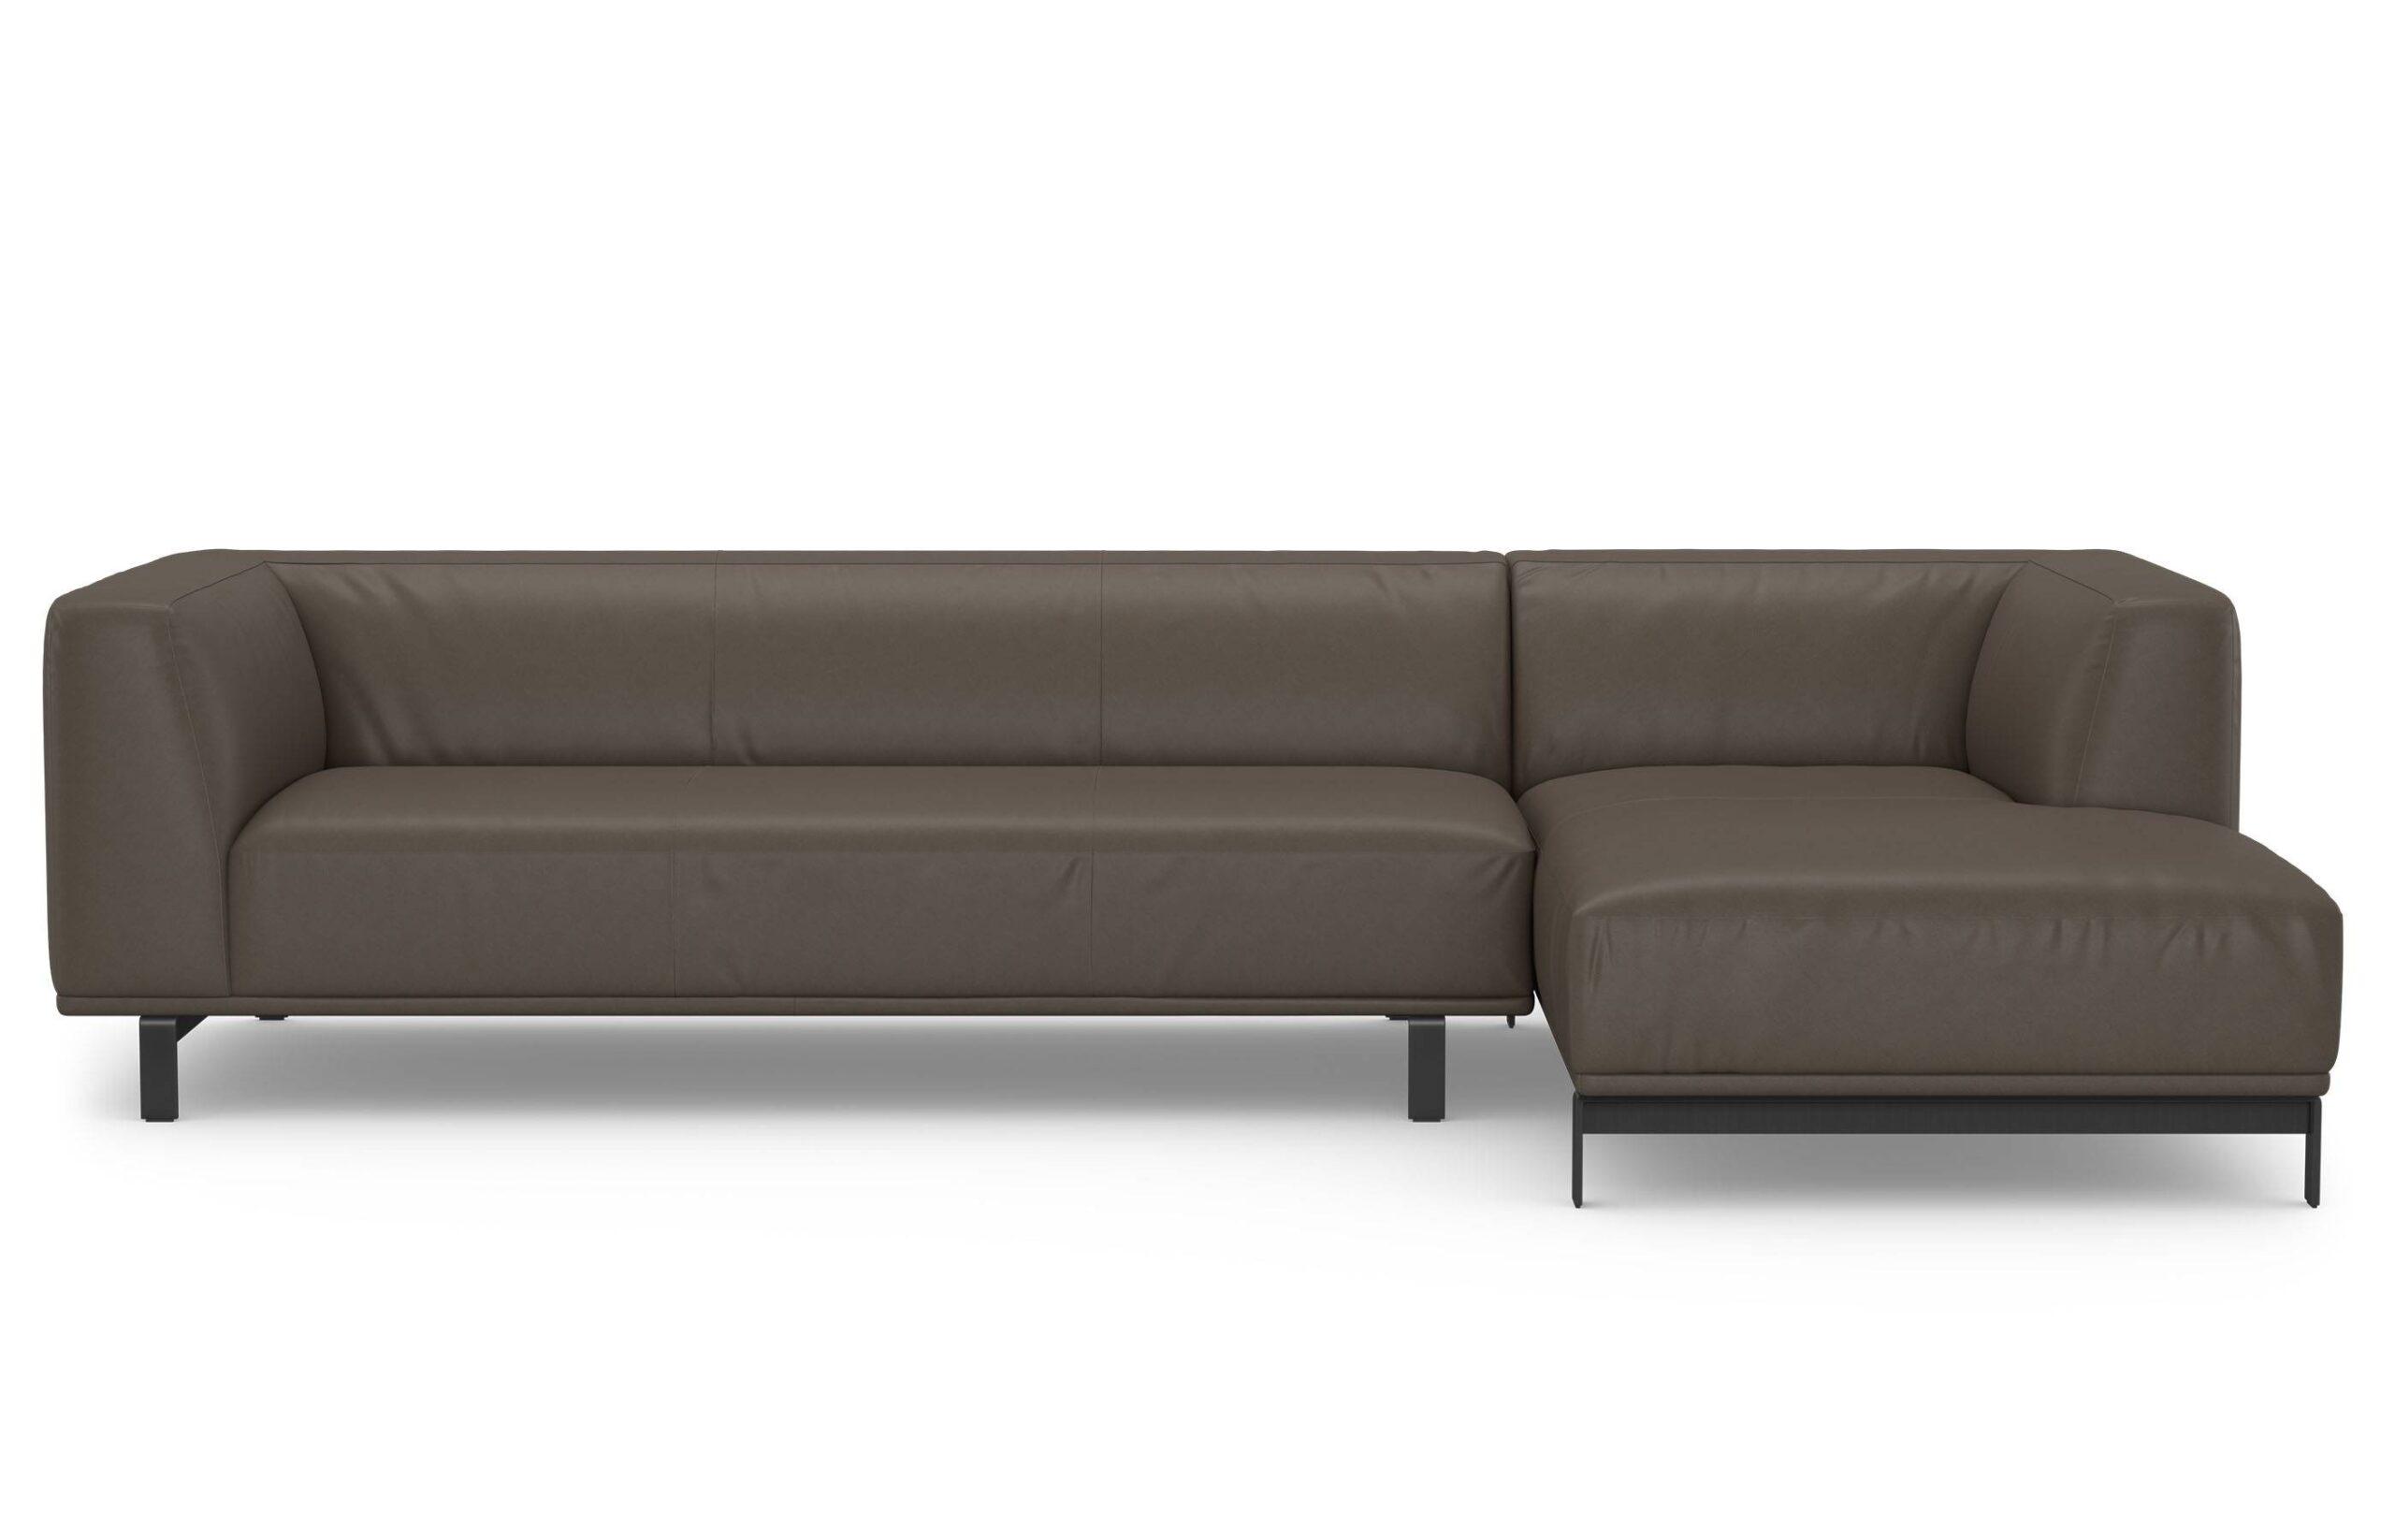 Full Size of Ledersofa Braun Design Sofa 2 Sitzer   Leder Chesterfield 3 Sitzer 3 2 1 Otto Gebraucht Rustikal Ikea Couch Vintage Kaufen Set Ecksofa View Sitzfeldtcom Sofa Sofa Leder Braun